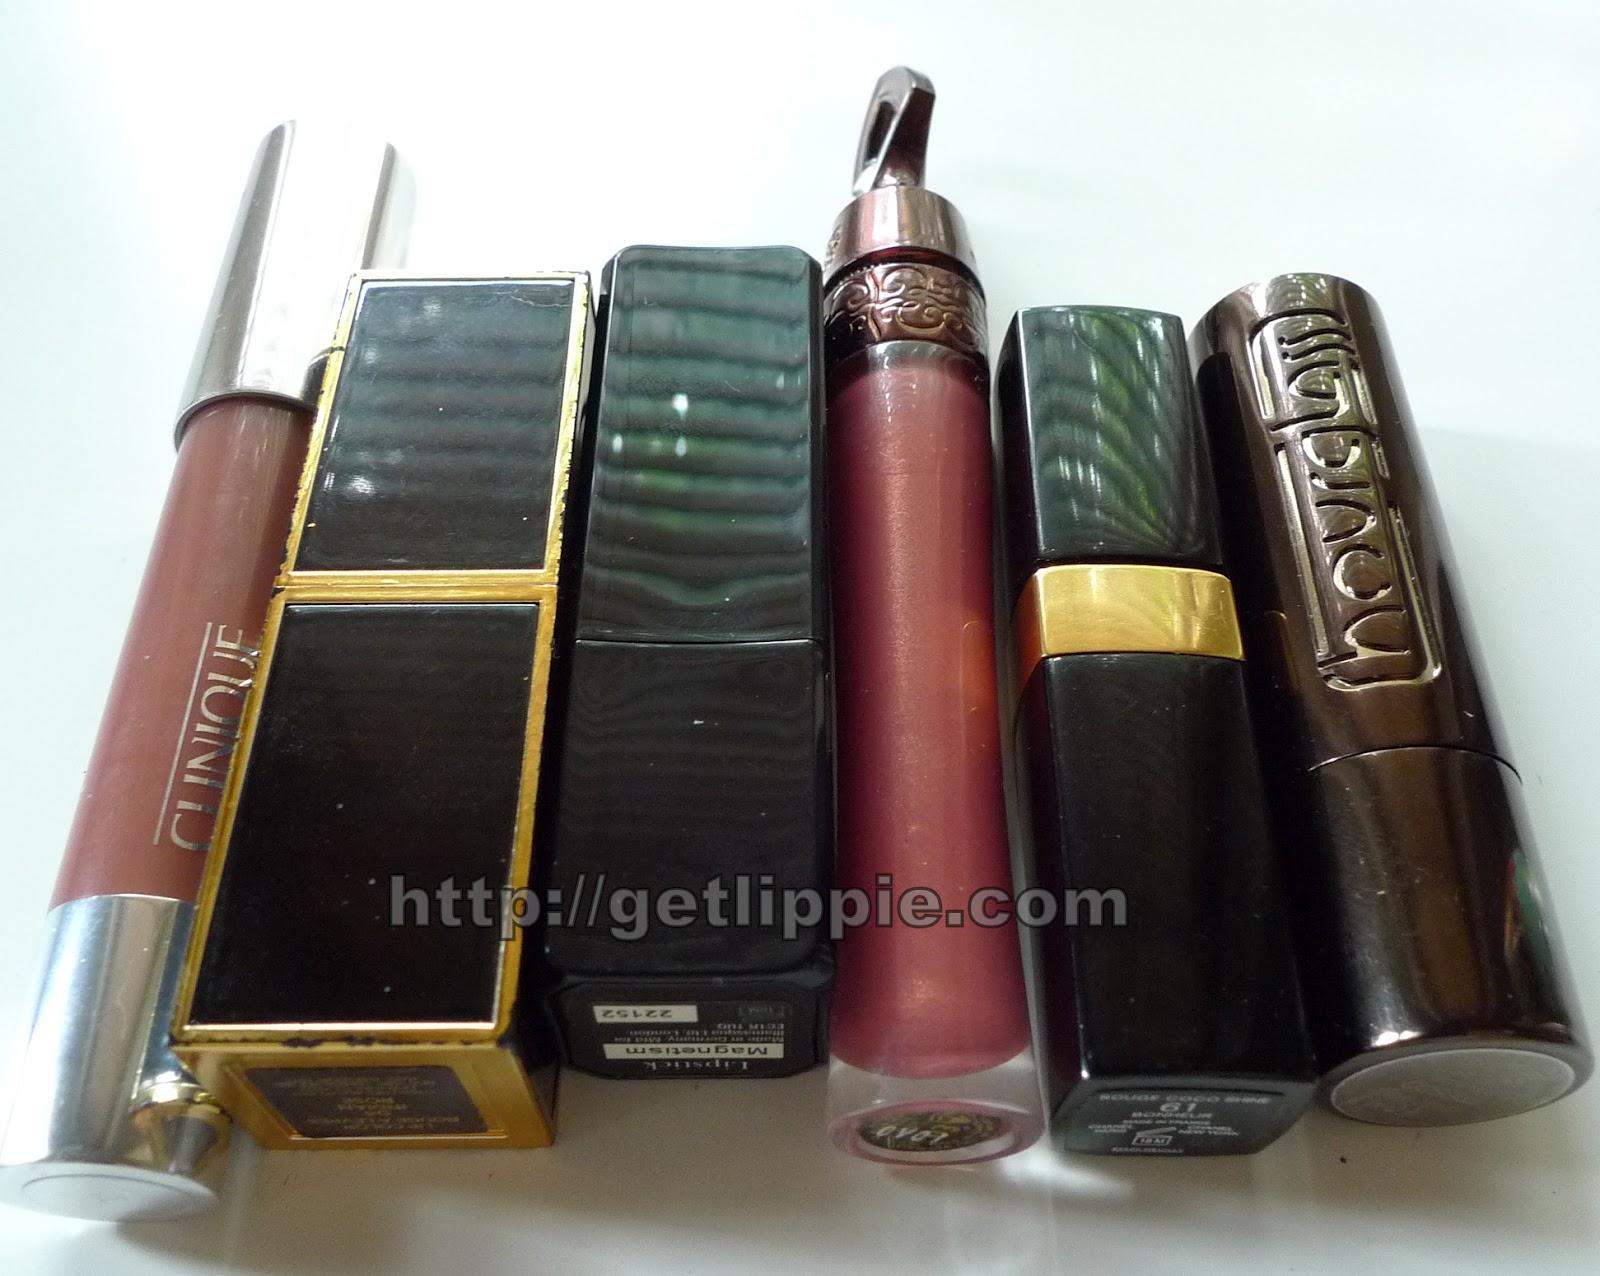 Http Www Clinique Com Product   Makeup Mascara Naturally Glossy Mascara